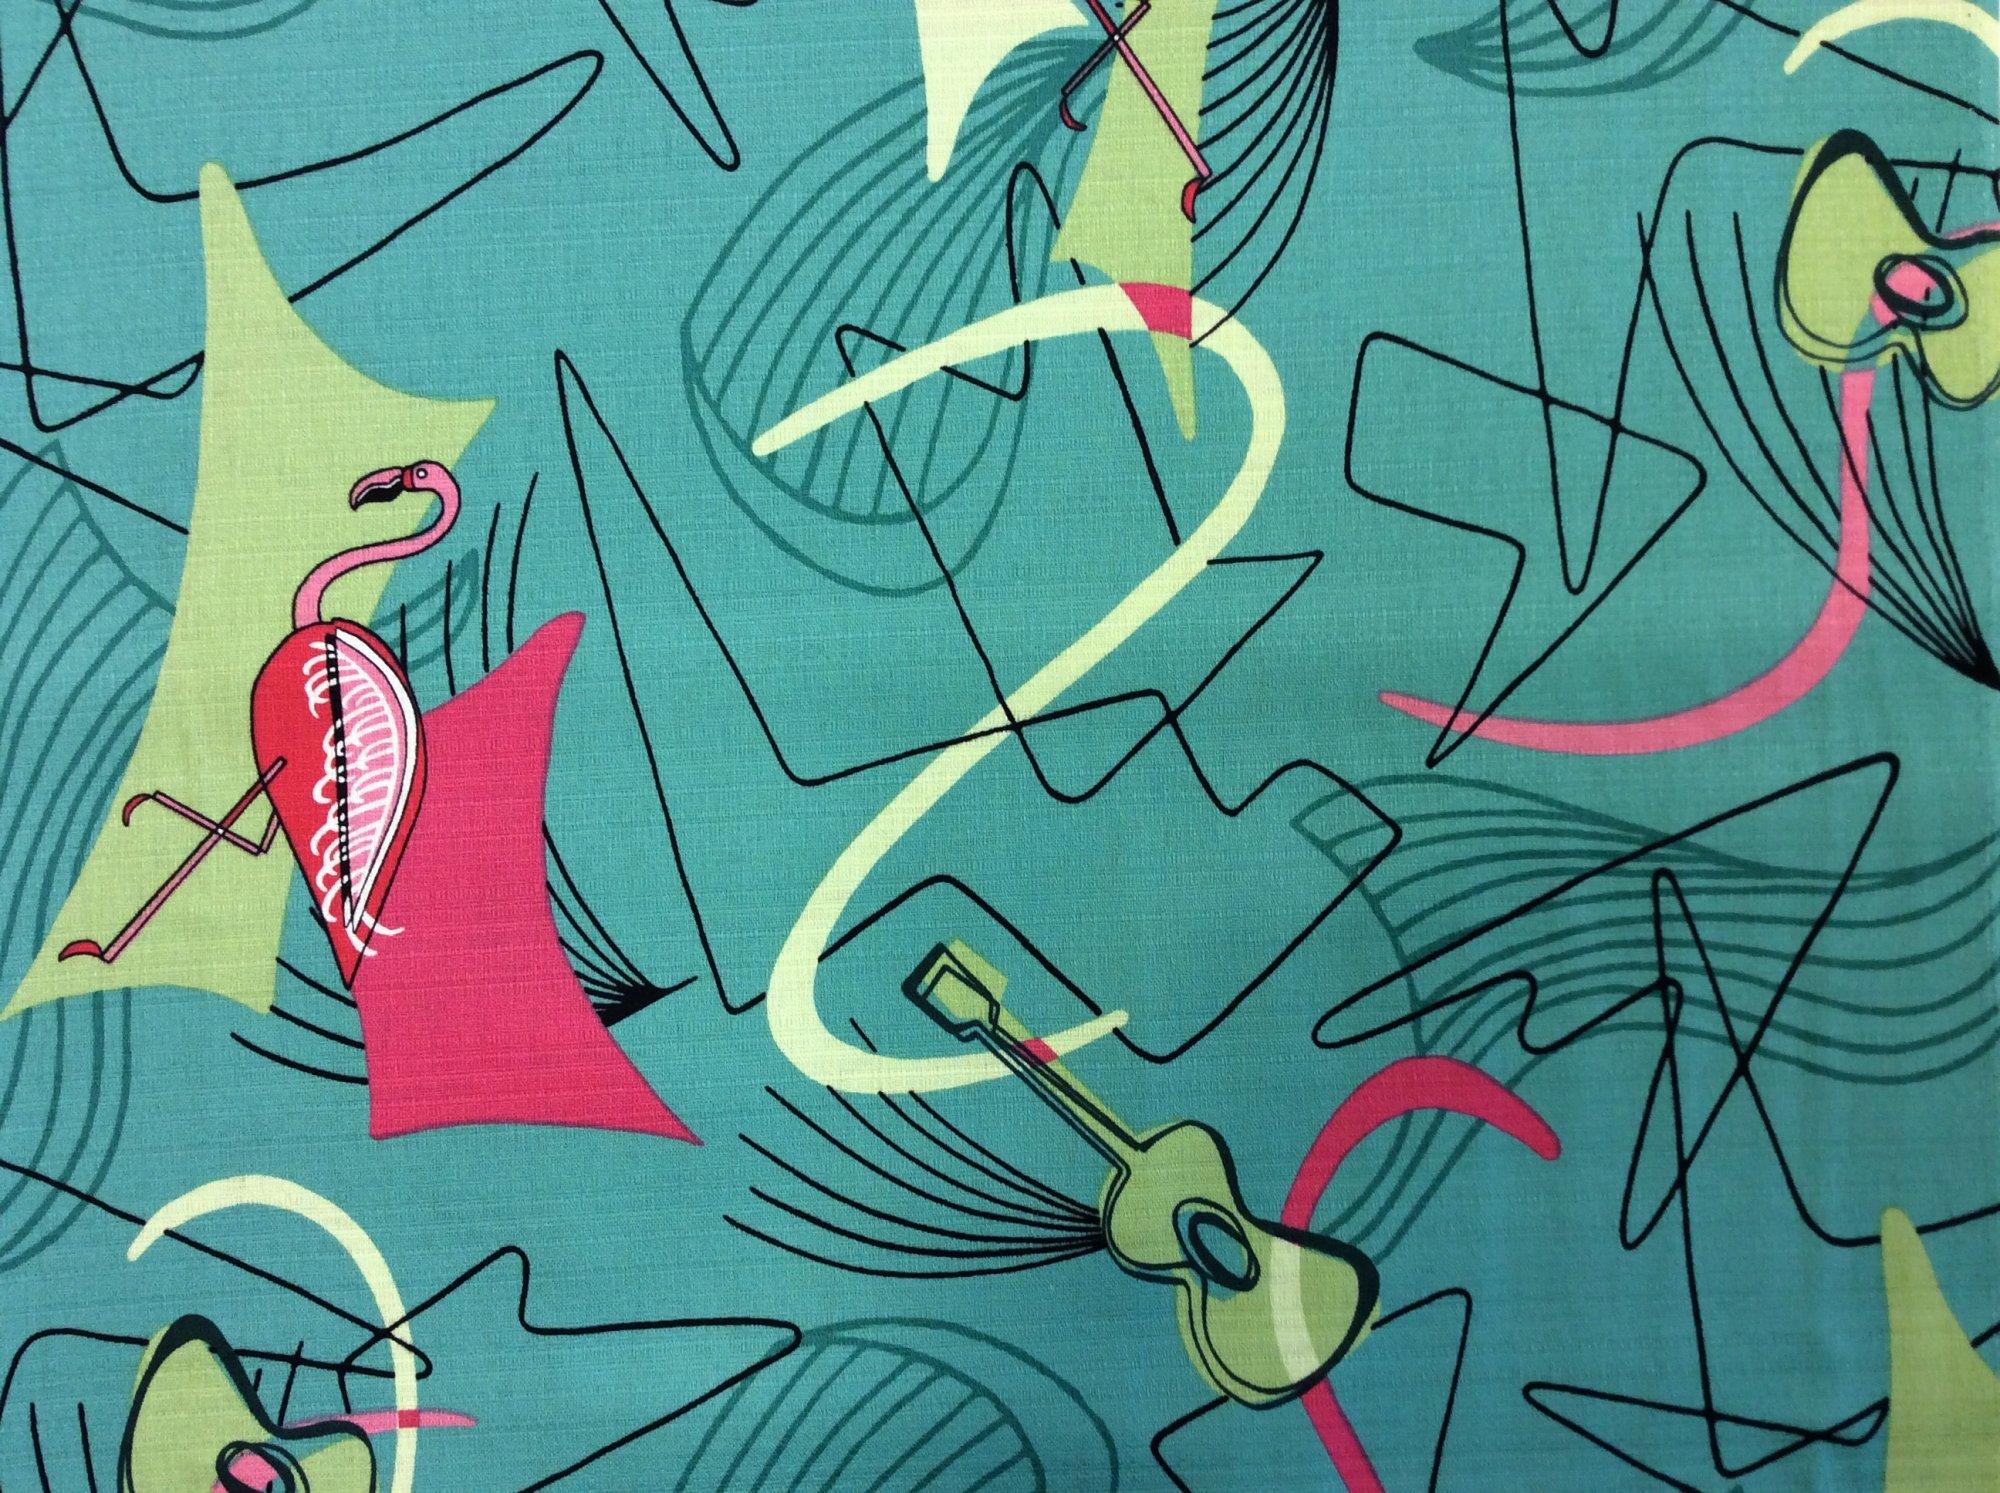 Atomic Retro Barkcloth Flamingo Boomerang Sputnik MCM Mid Century Modern Slubby Texture Home Dec Cotton Fabric NT38